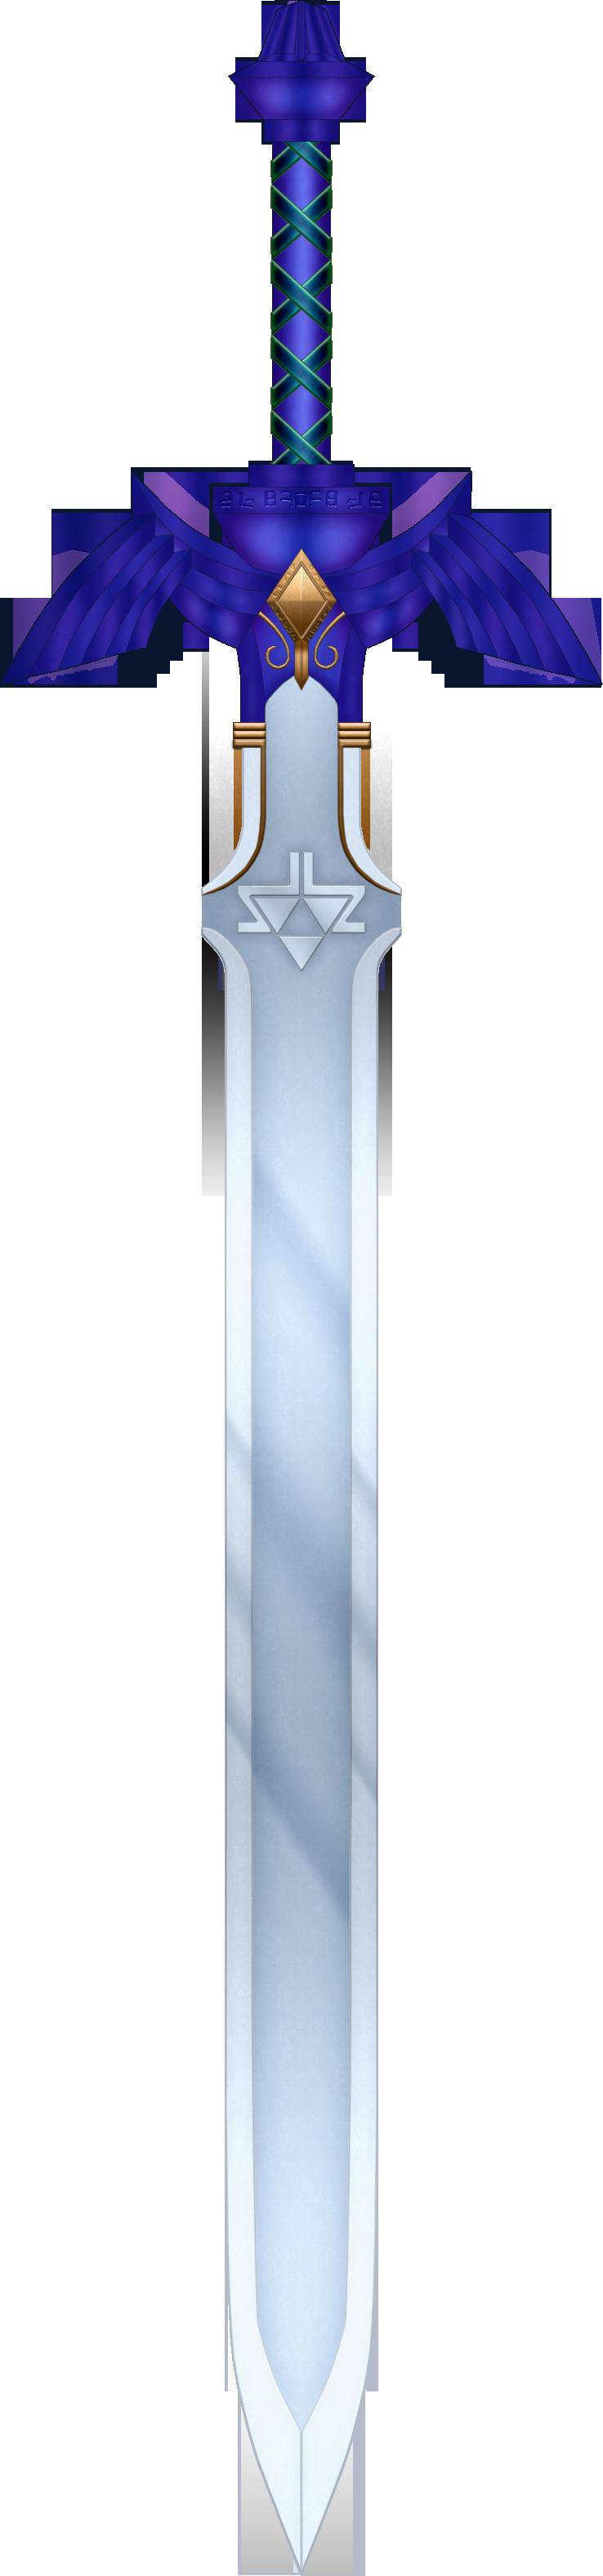 TP Master Sword By BLUEamnesiacdeviantart On DeviantART